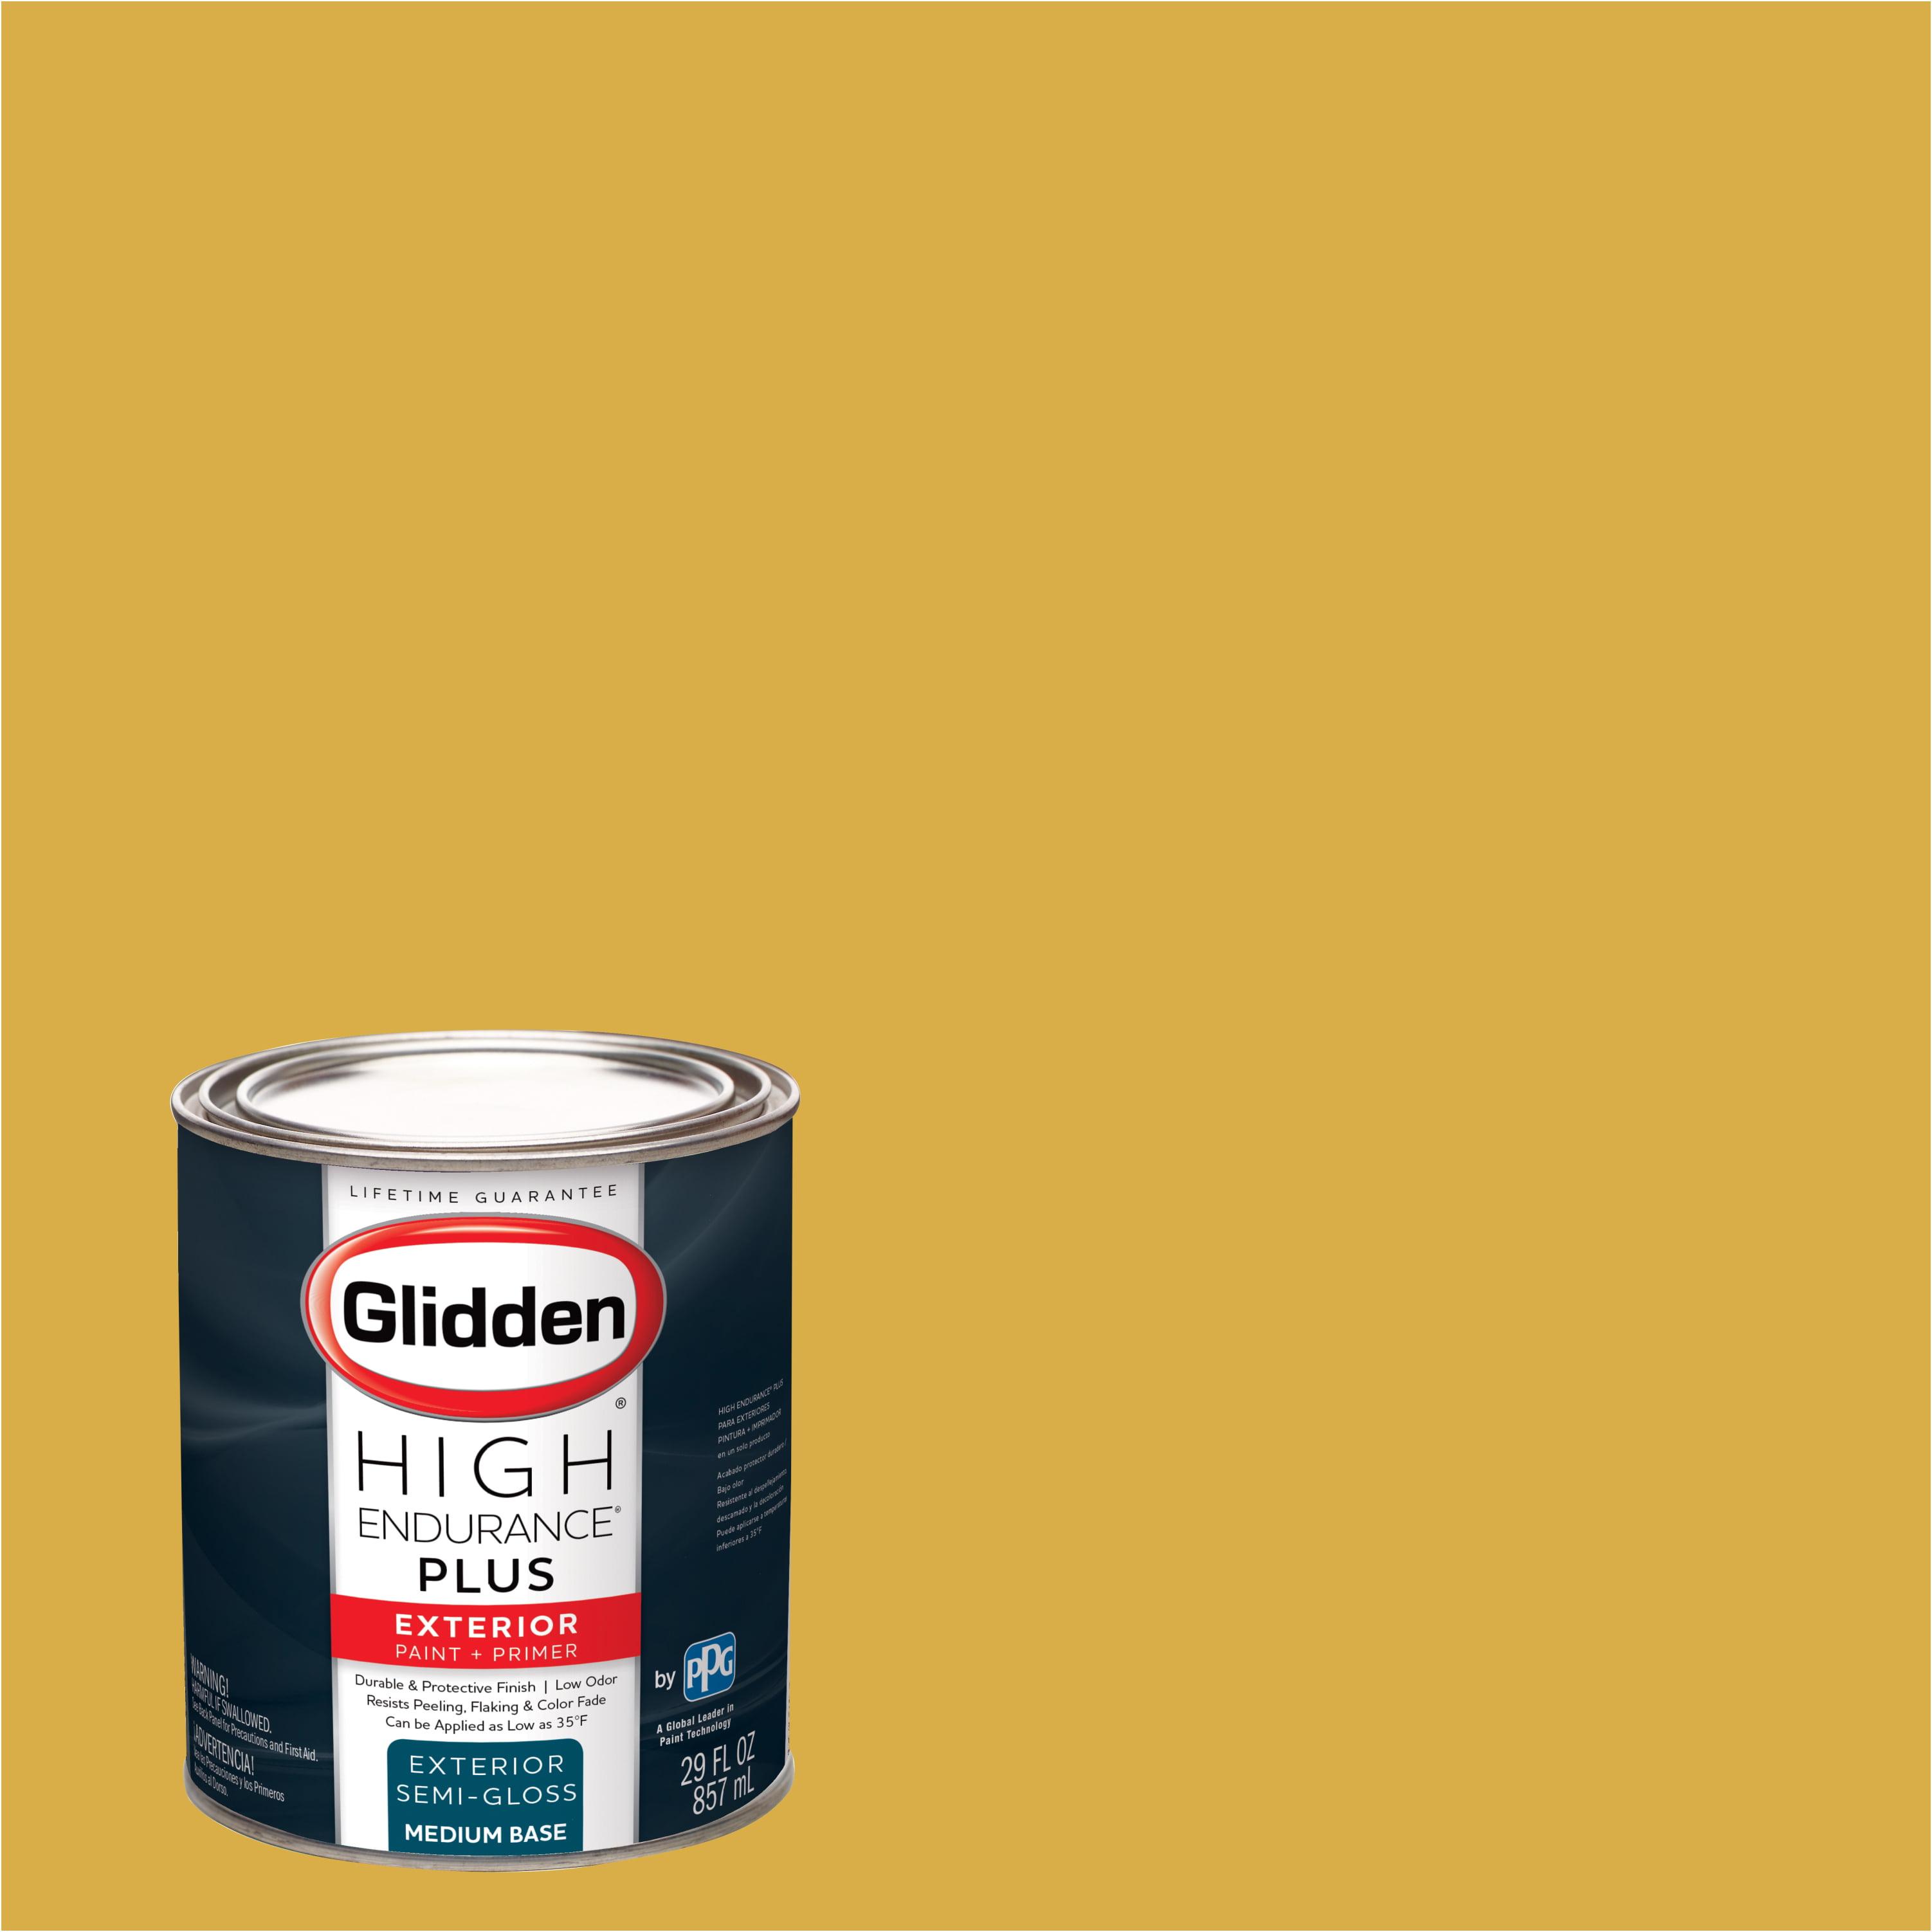 Glidden High Endurance Plus Exterior Paint and Primer, Golden Rae, #30YY 49/562